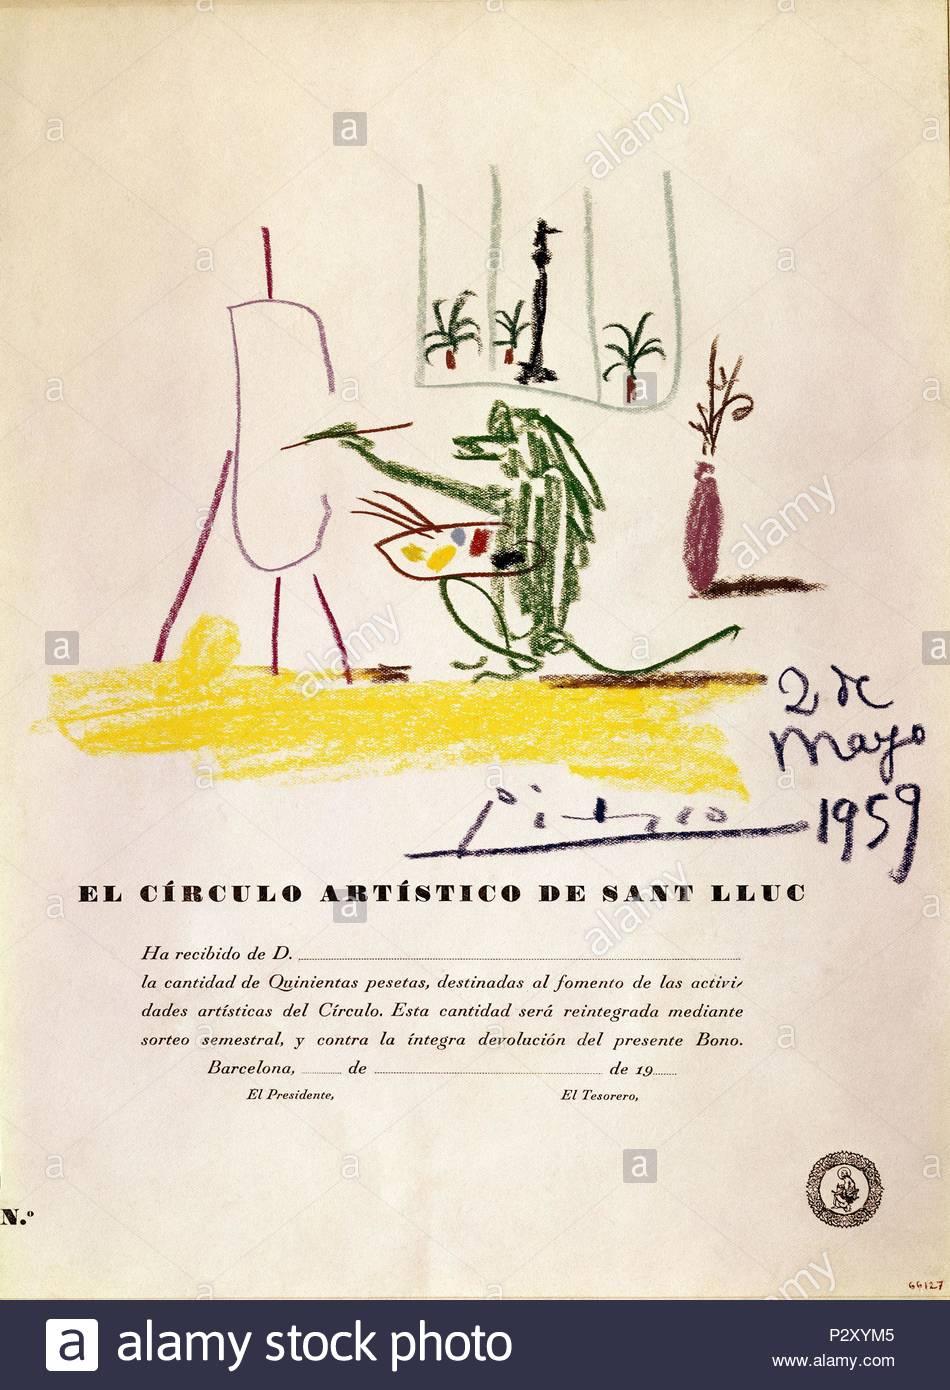 Spanish school. Drawing realized for The Artistic Circle of Sant Lluc. Dibujo realisado para el circulo Artistico de Sant Lluc. 1959 . Barcelona, Picasso Museum. Author: Pablo Picasso (1881-1973). Location: PICASSO MUSEUM, BARCELONA, SPAIN. - Stock Image